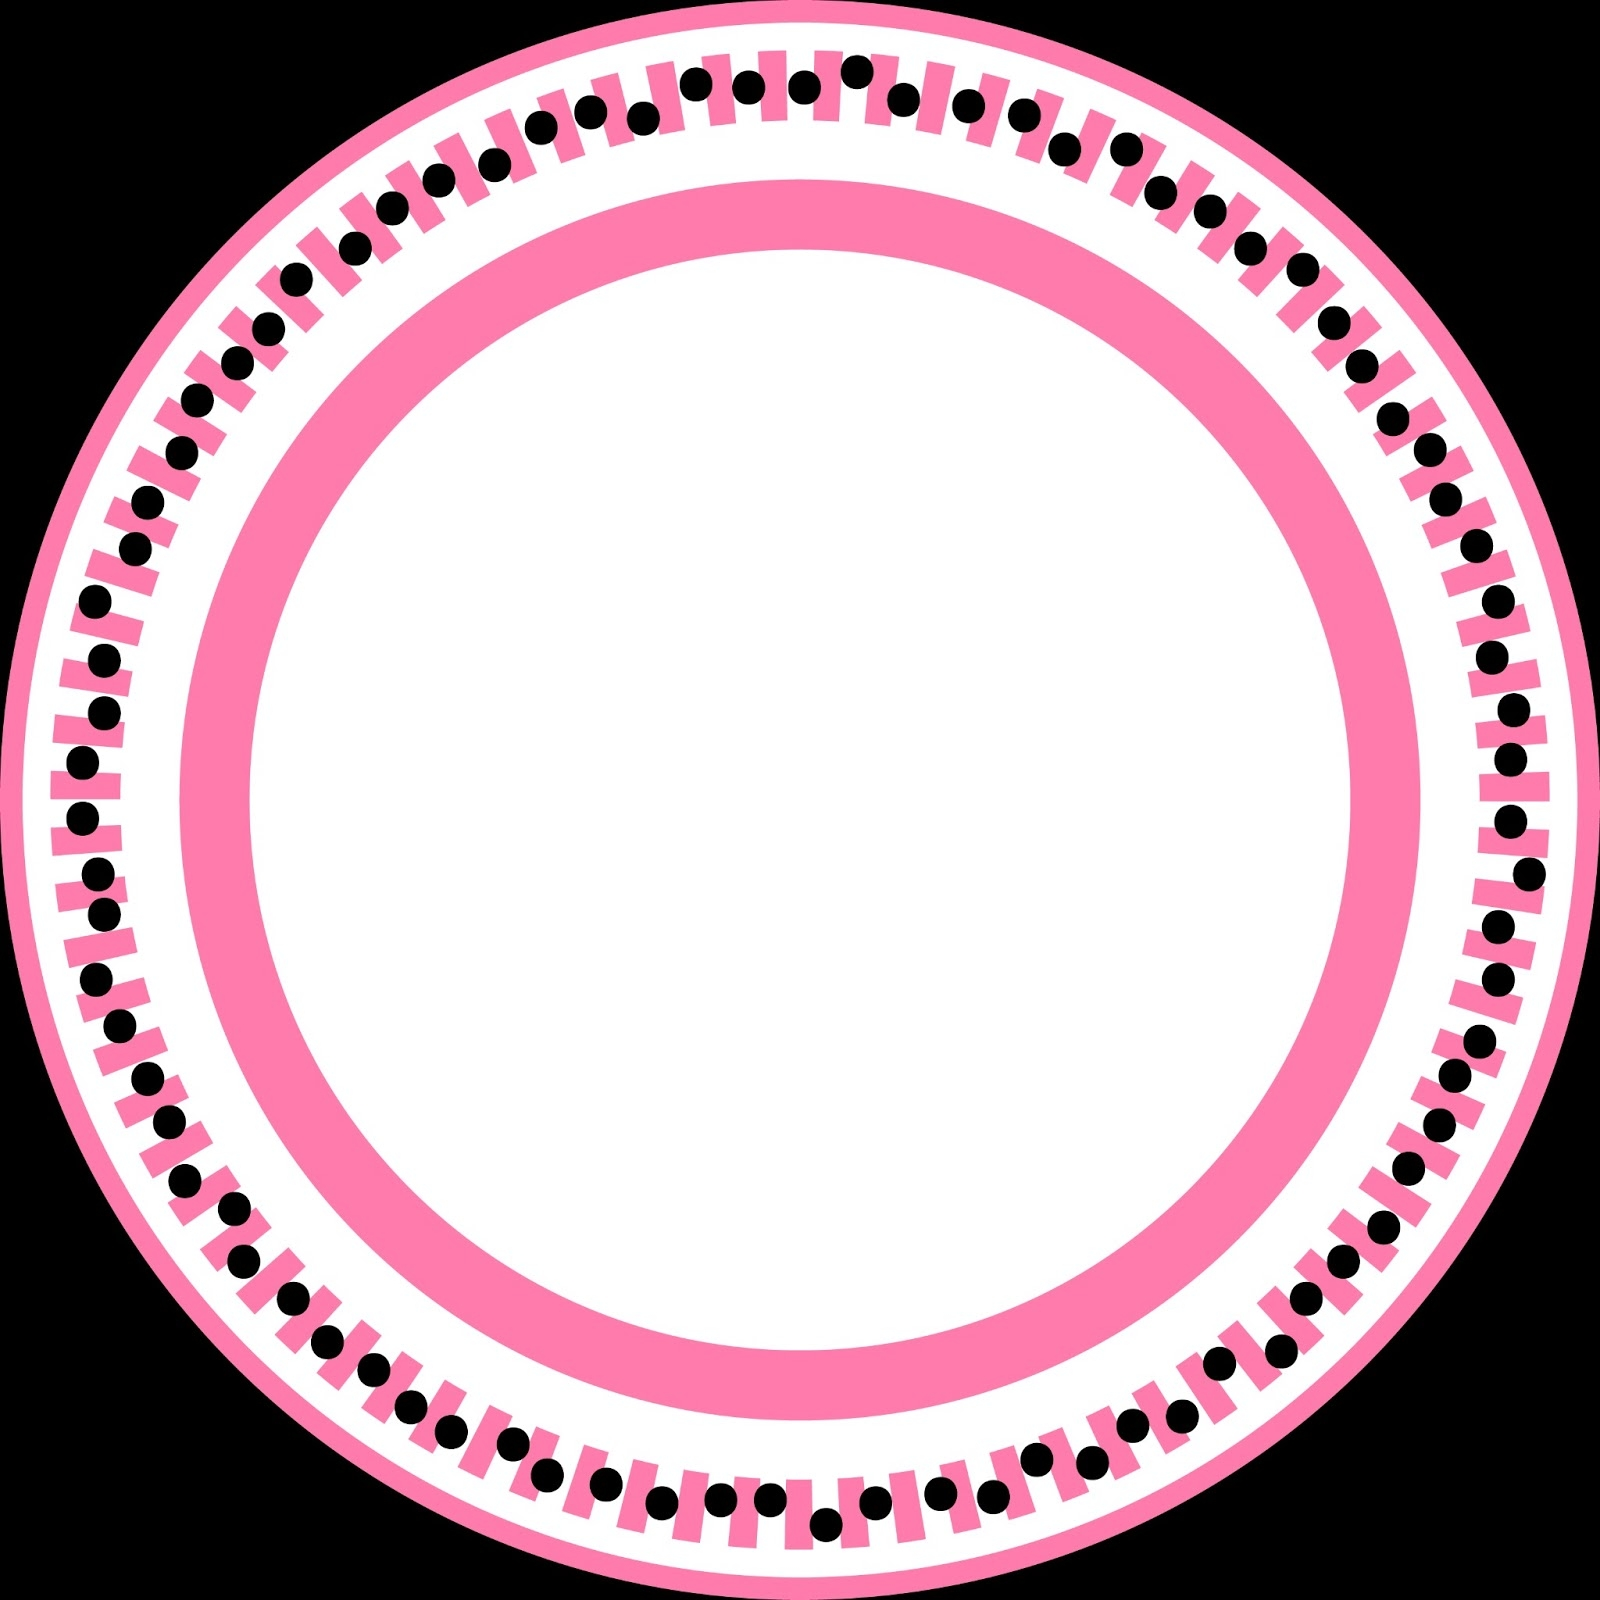 Circle Things Clipart.